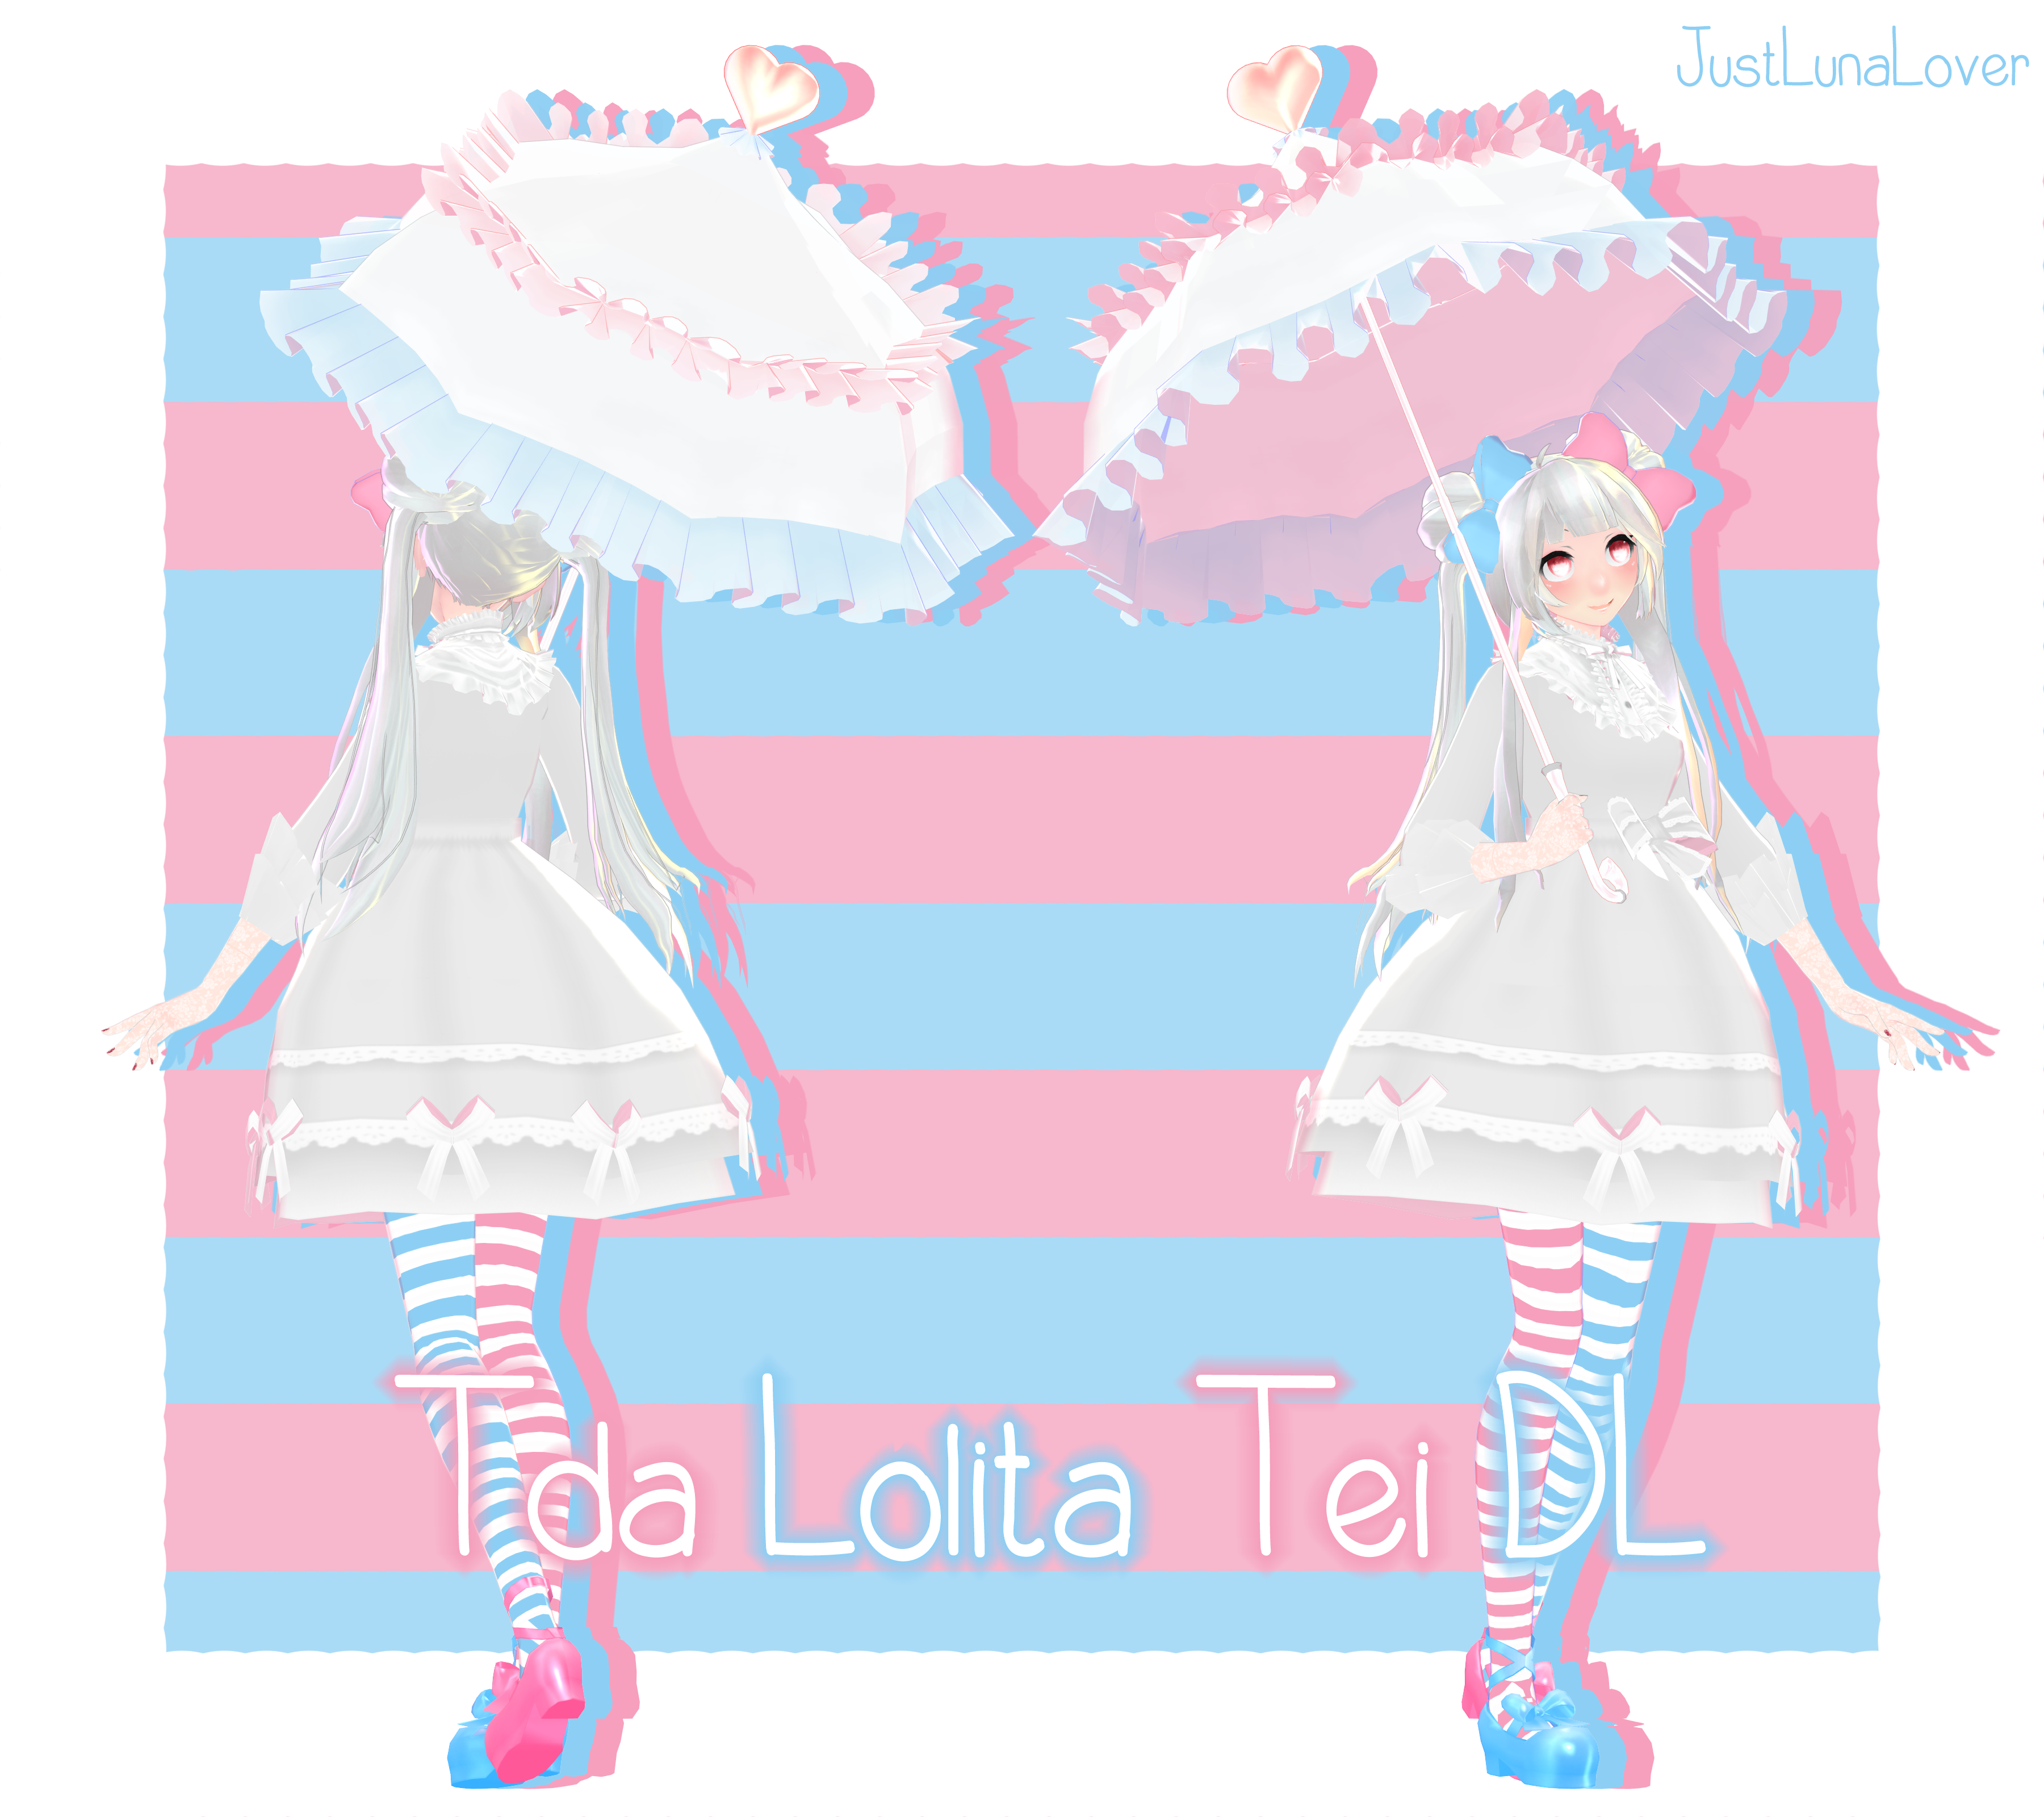 Mmd Tda Lolita Tei Dl Por Luna Panda Amor Nice Dresses Panda